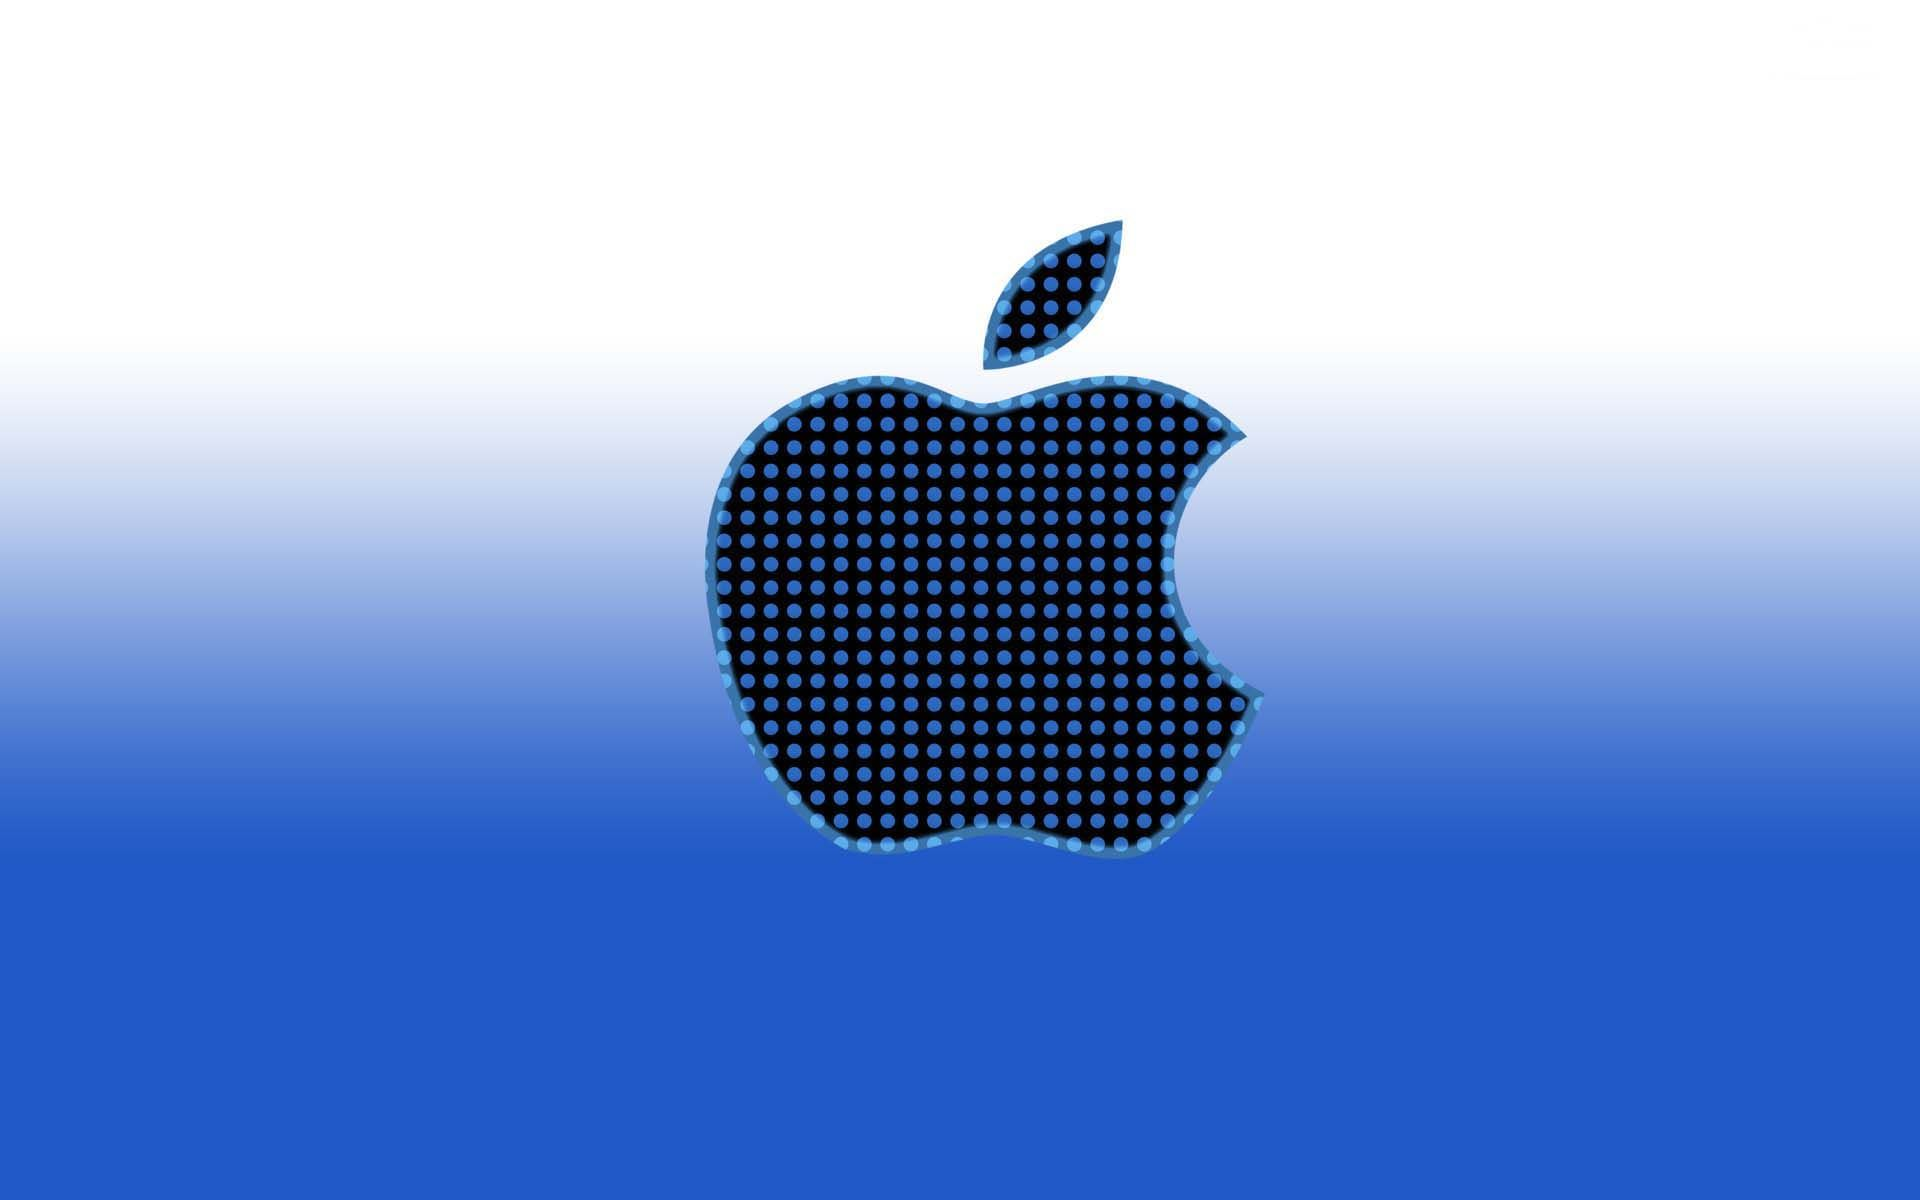 Computers Apple Logo Free Download Wallpaper 1920x1200 Apple Logo Wallpaper Apple Wallpaper Apple Logo